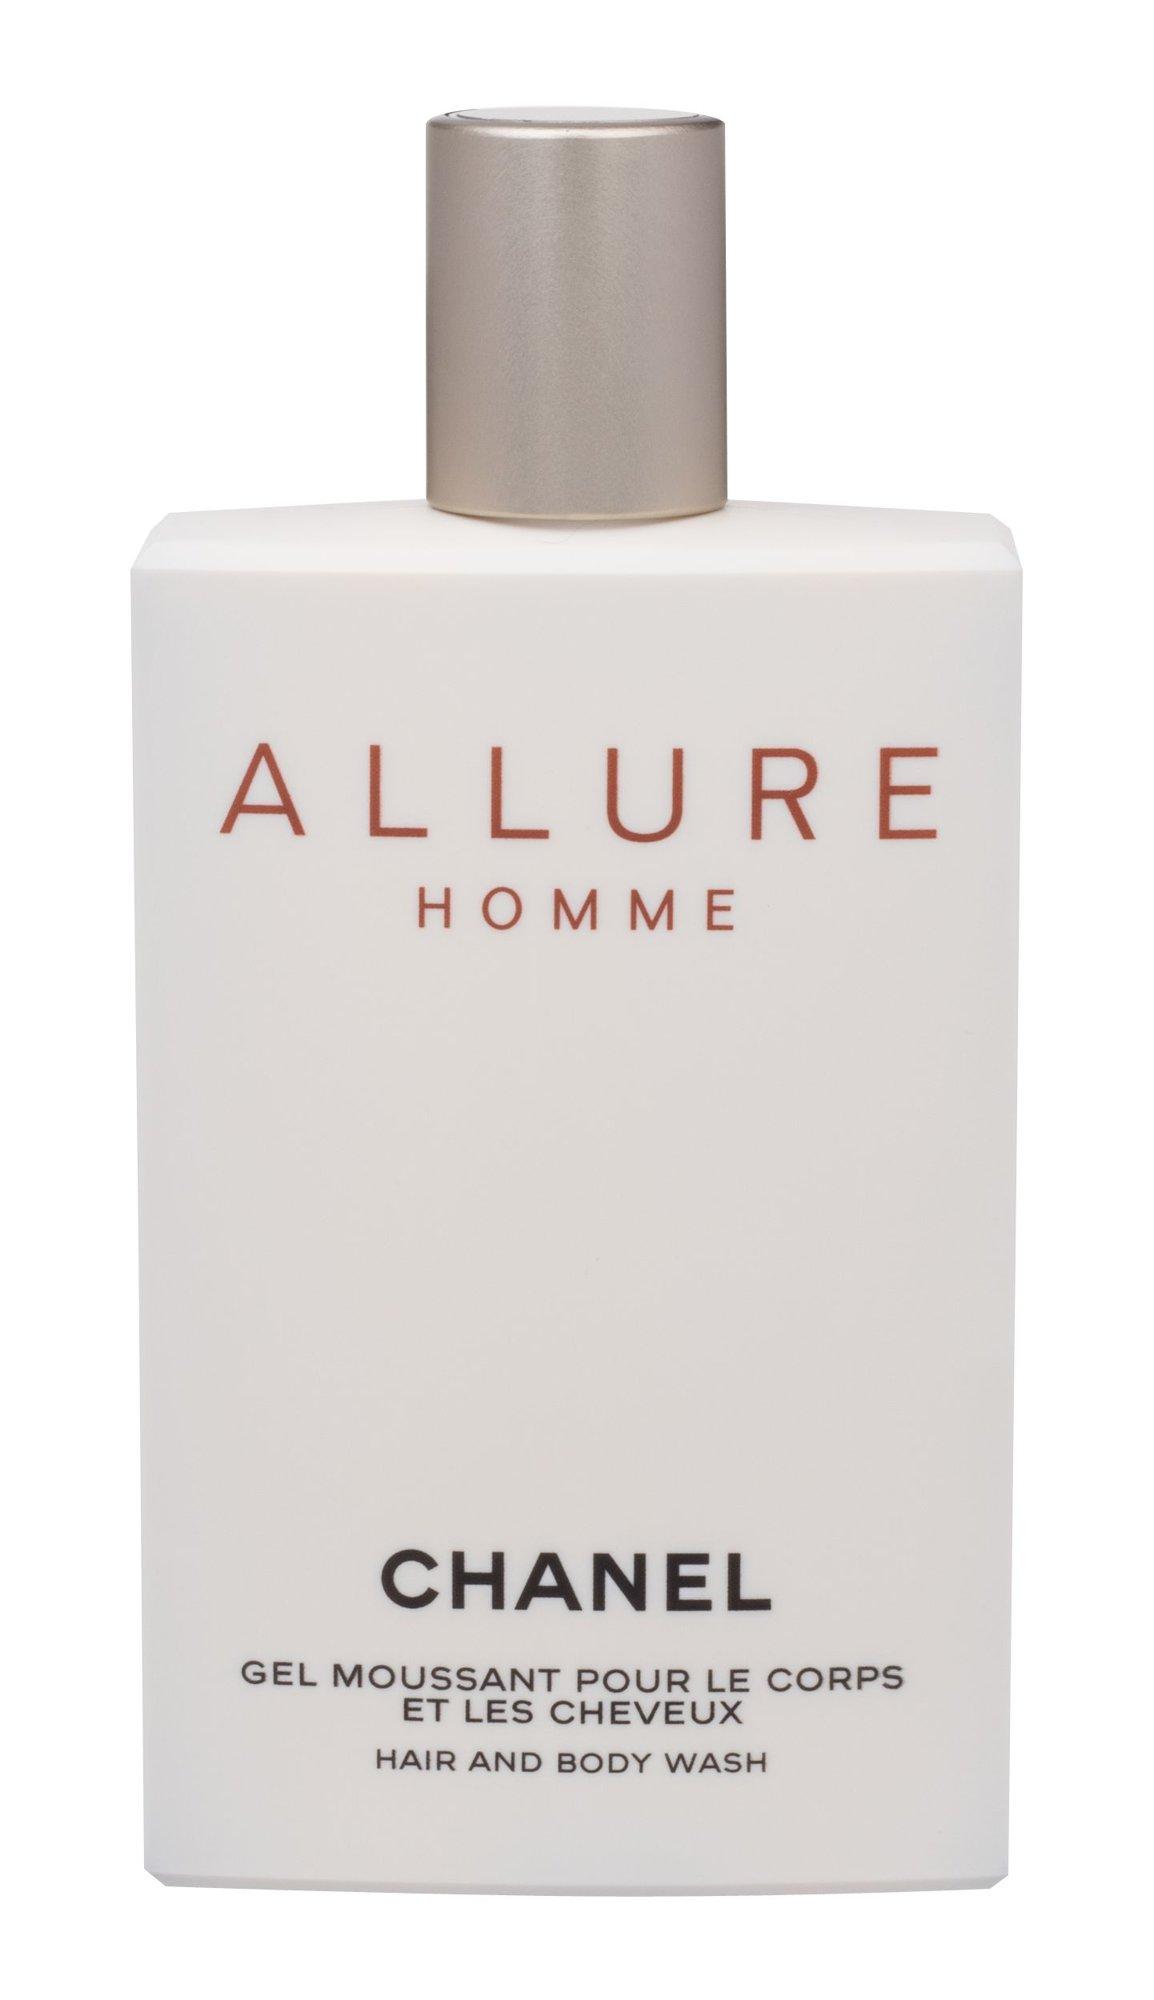 Chanel Allure Homme Shower gel 200ml